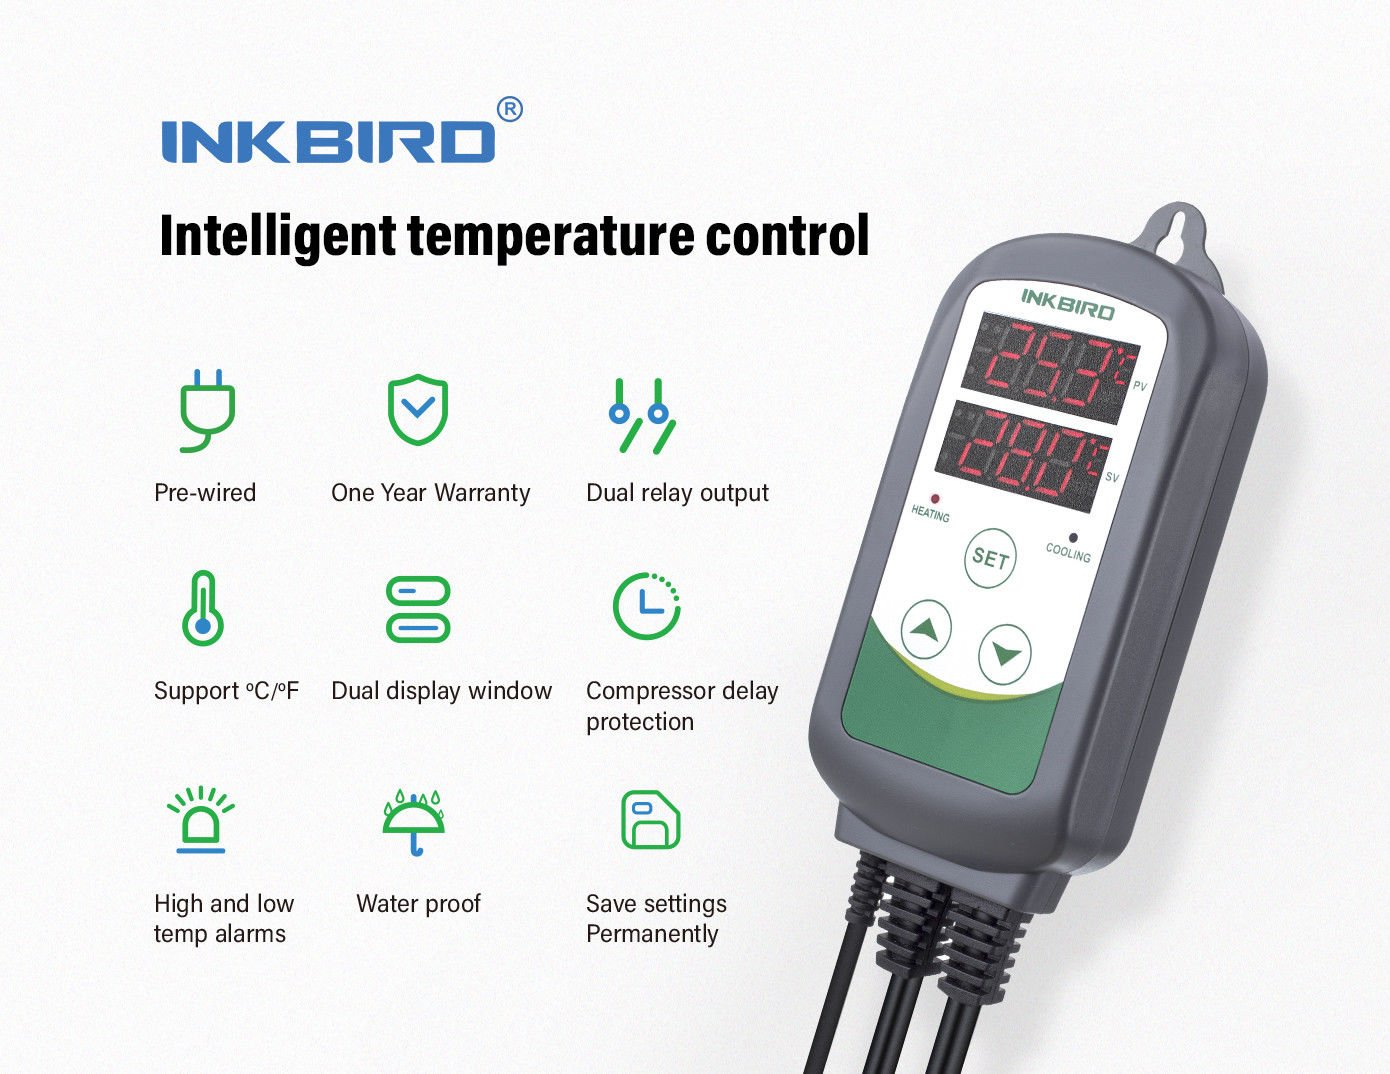 Inkbird Itc 308 Digital Temperature Controller Thermostat Regulator Heat Sensor Automatic Control Uk Socket Dual Relays 1 Heating Cooling 220v Plug Diy Tools